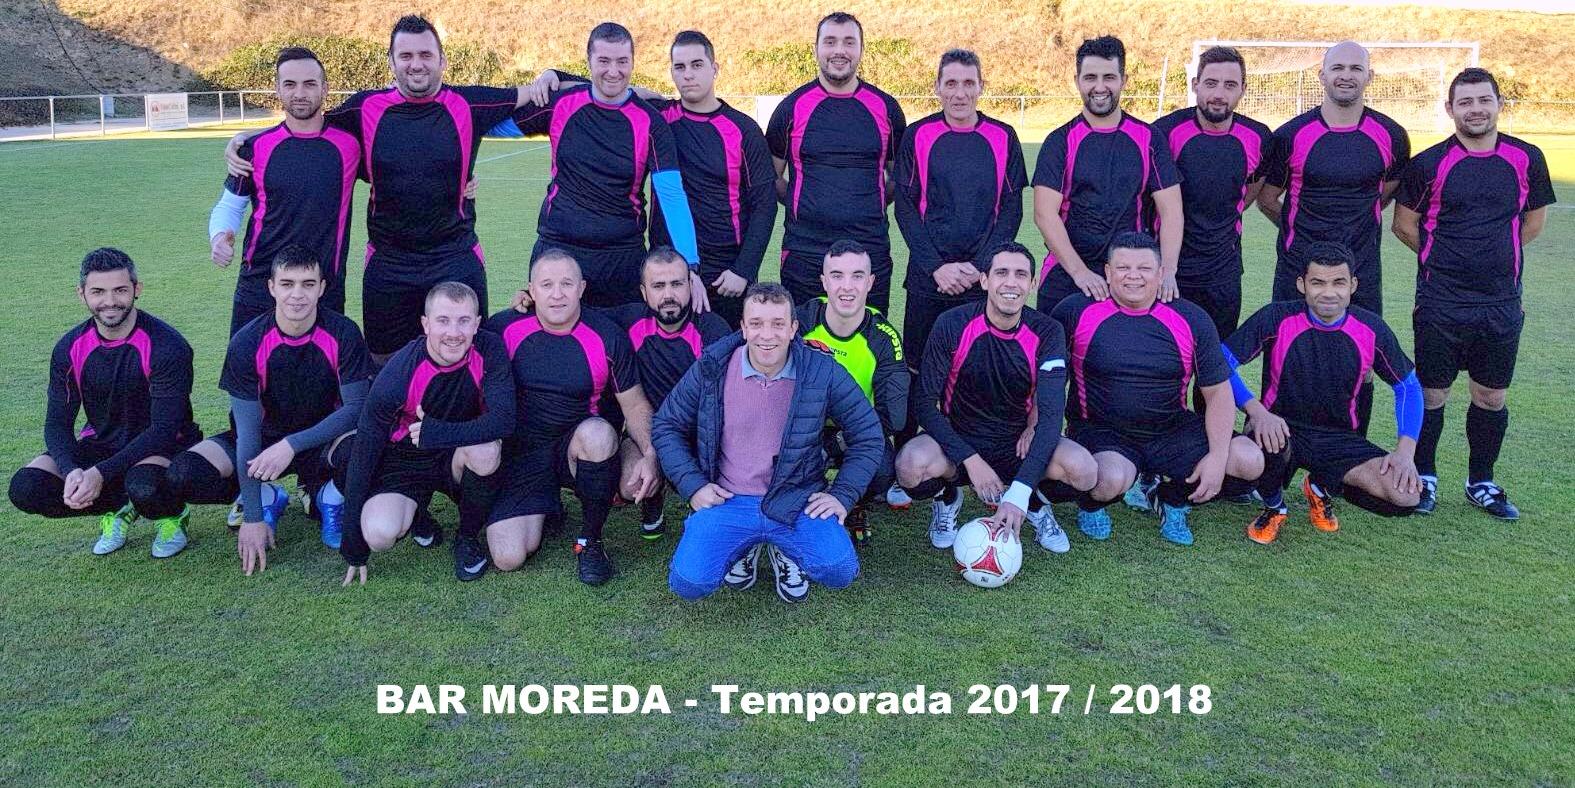 bar moreda 17 18